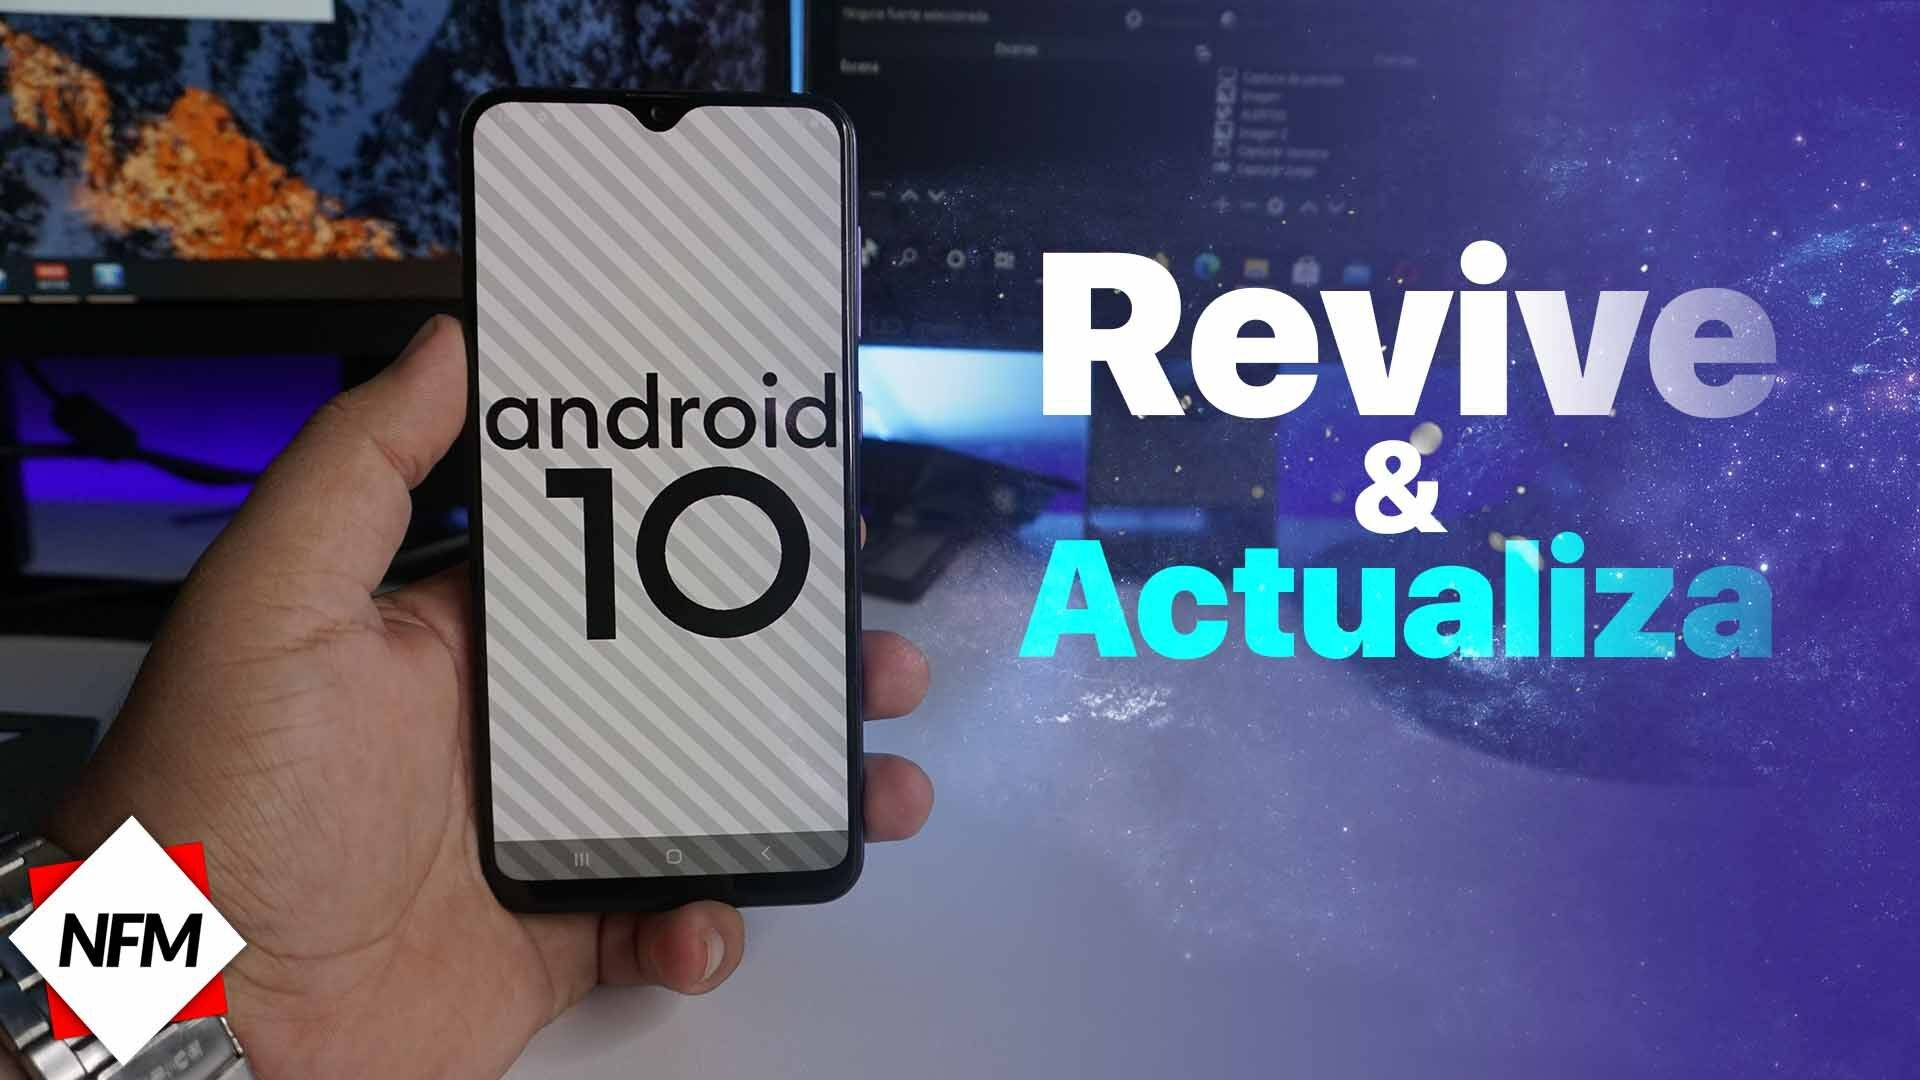 Samsung Galaxy A30S (A307G/f/fn/gn)  Actuliza a Android 10   revivelo si no enciende  firmware   Version actulizada 2021 2